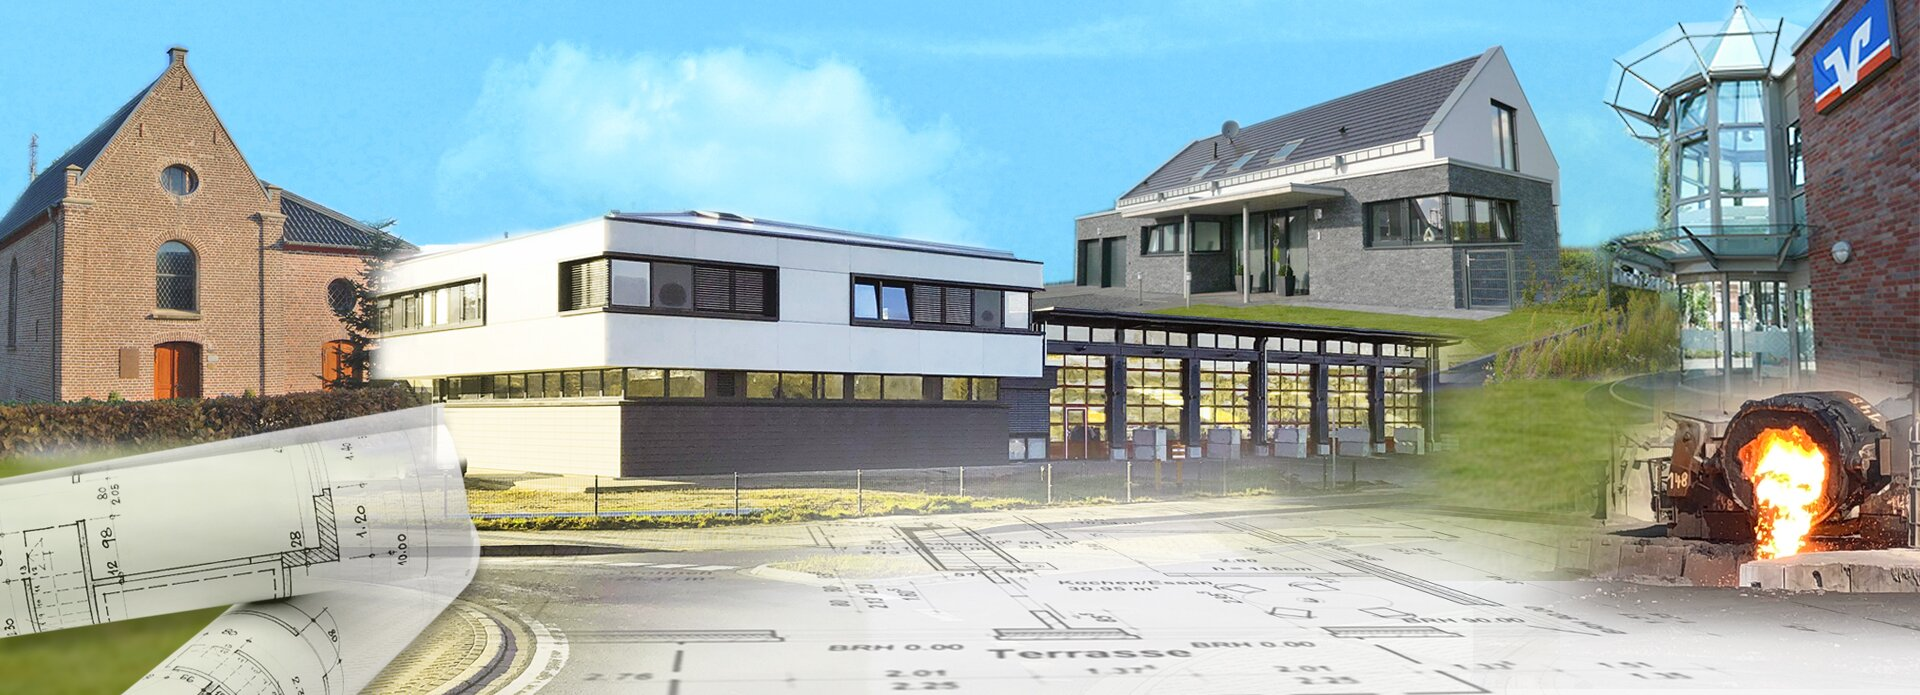 Architekt Xanten   Architekturbüro Dipl. Ing. Markus Kasuch Xanten ...